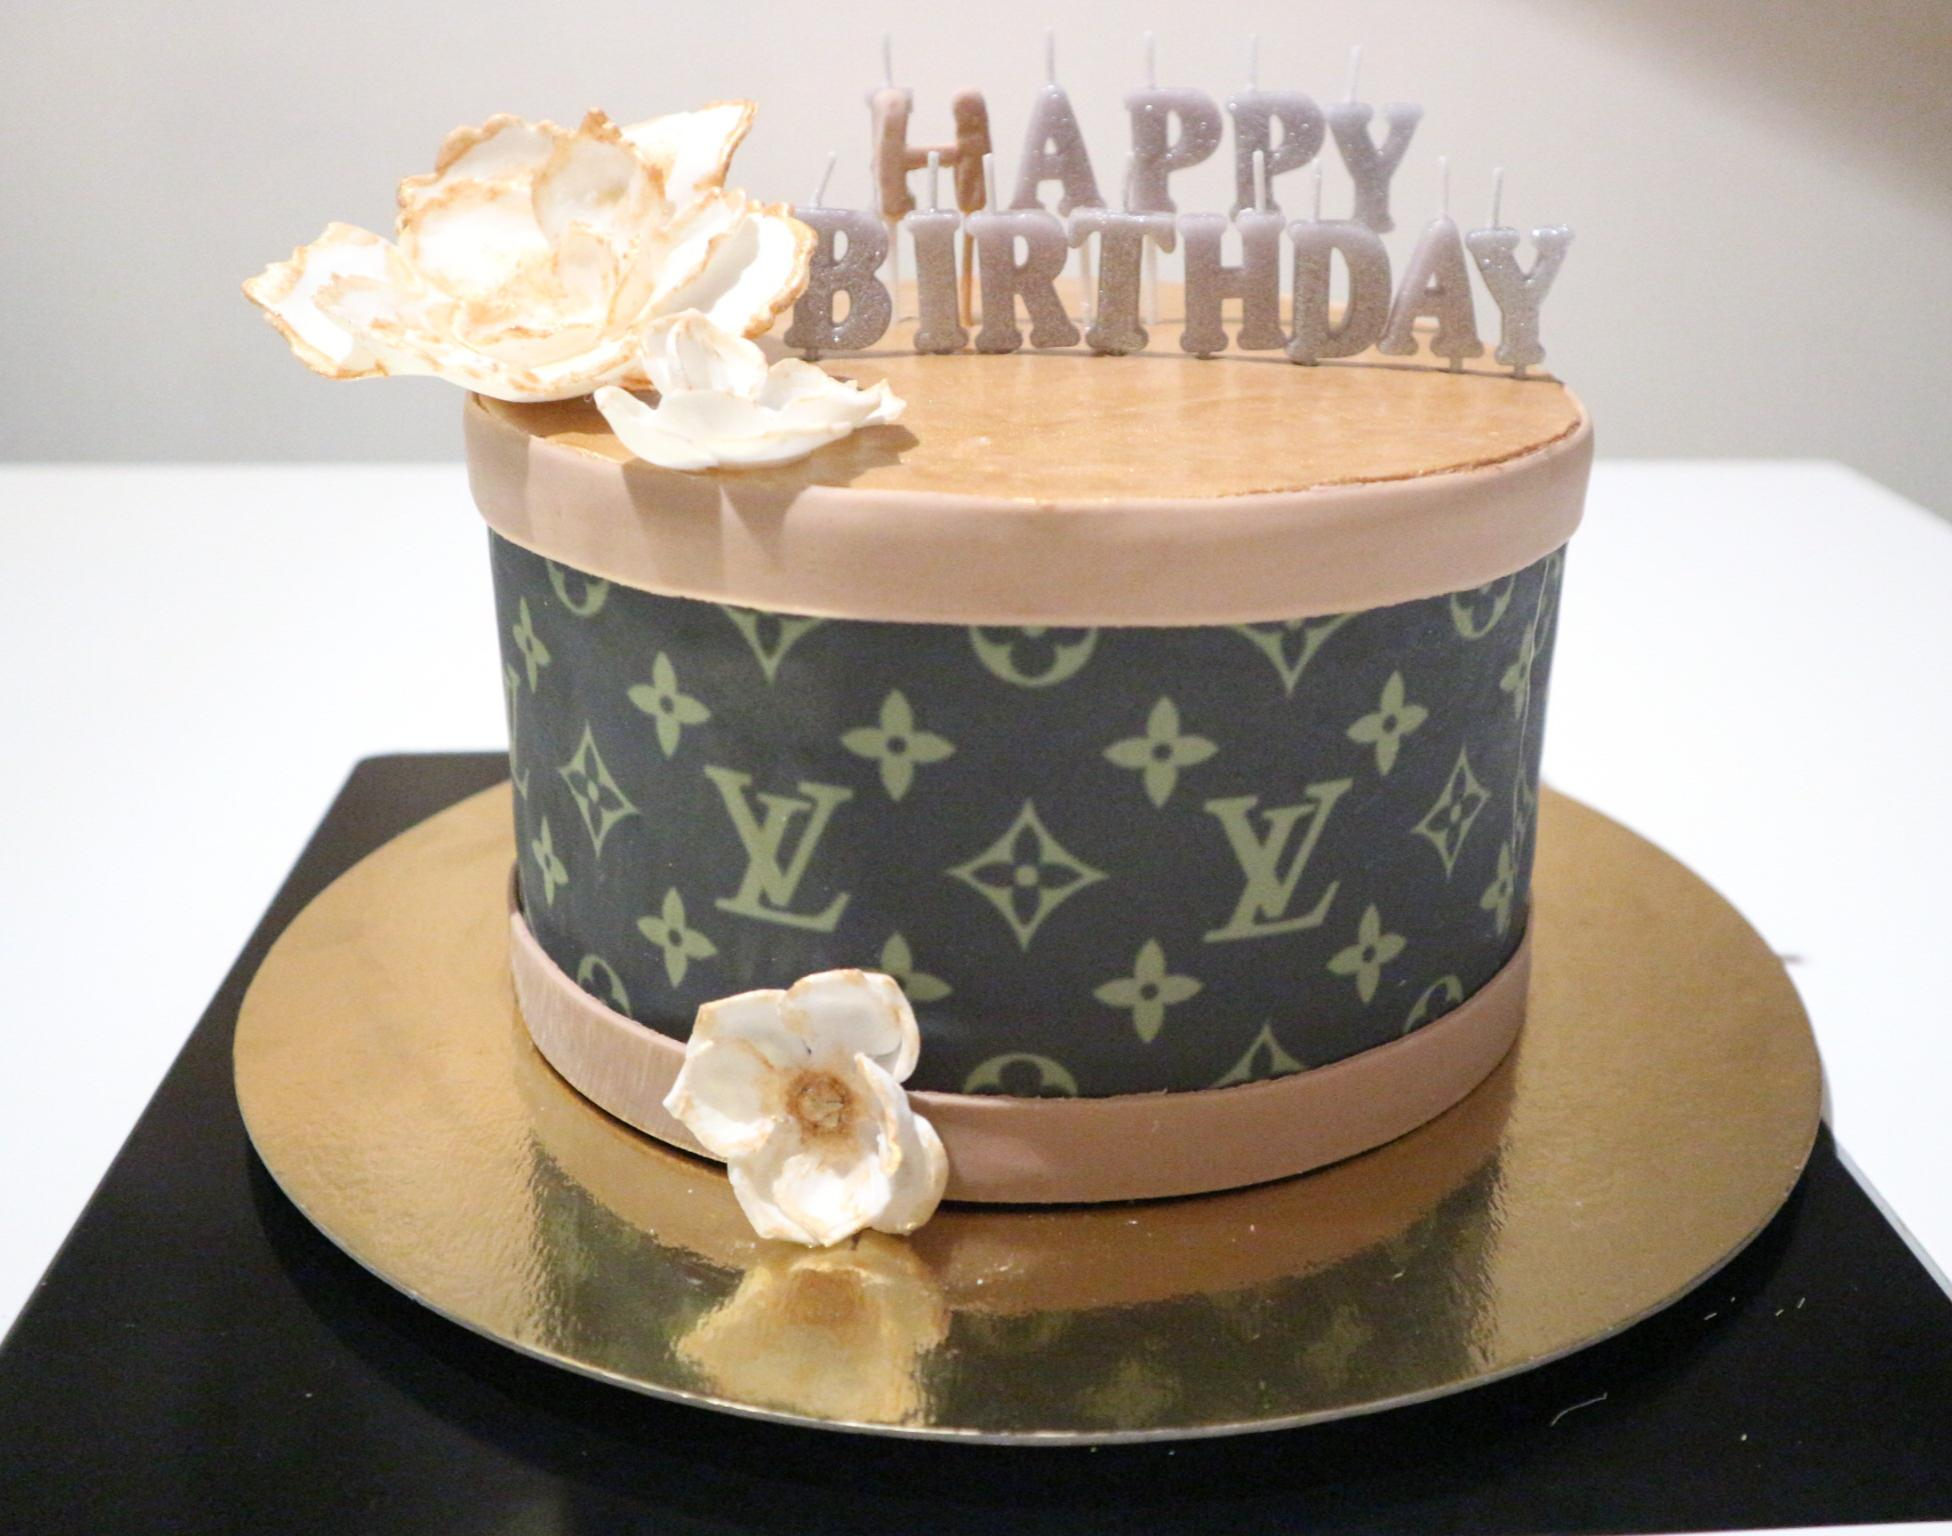 Birthday Cake For My Best Friend Cakedecorating